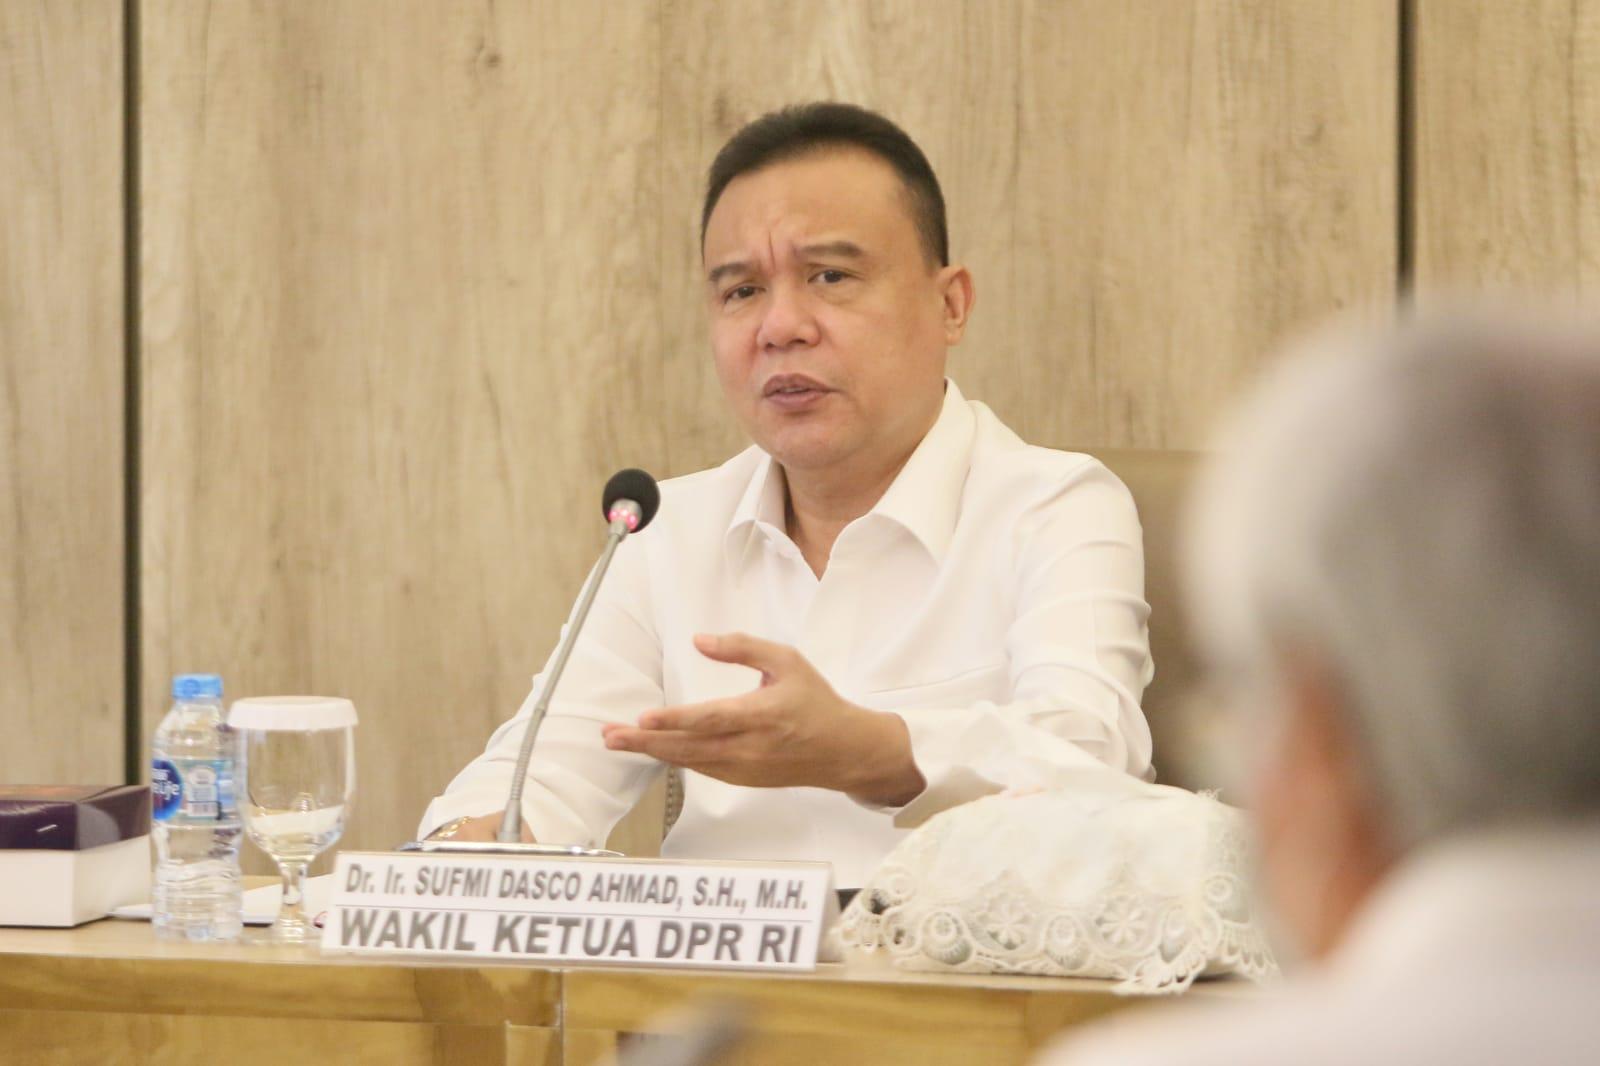 Sufmi Dasco Minta Polri dan OJK Tindak Tegas Pinjol Illegal